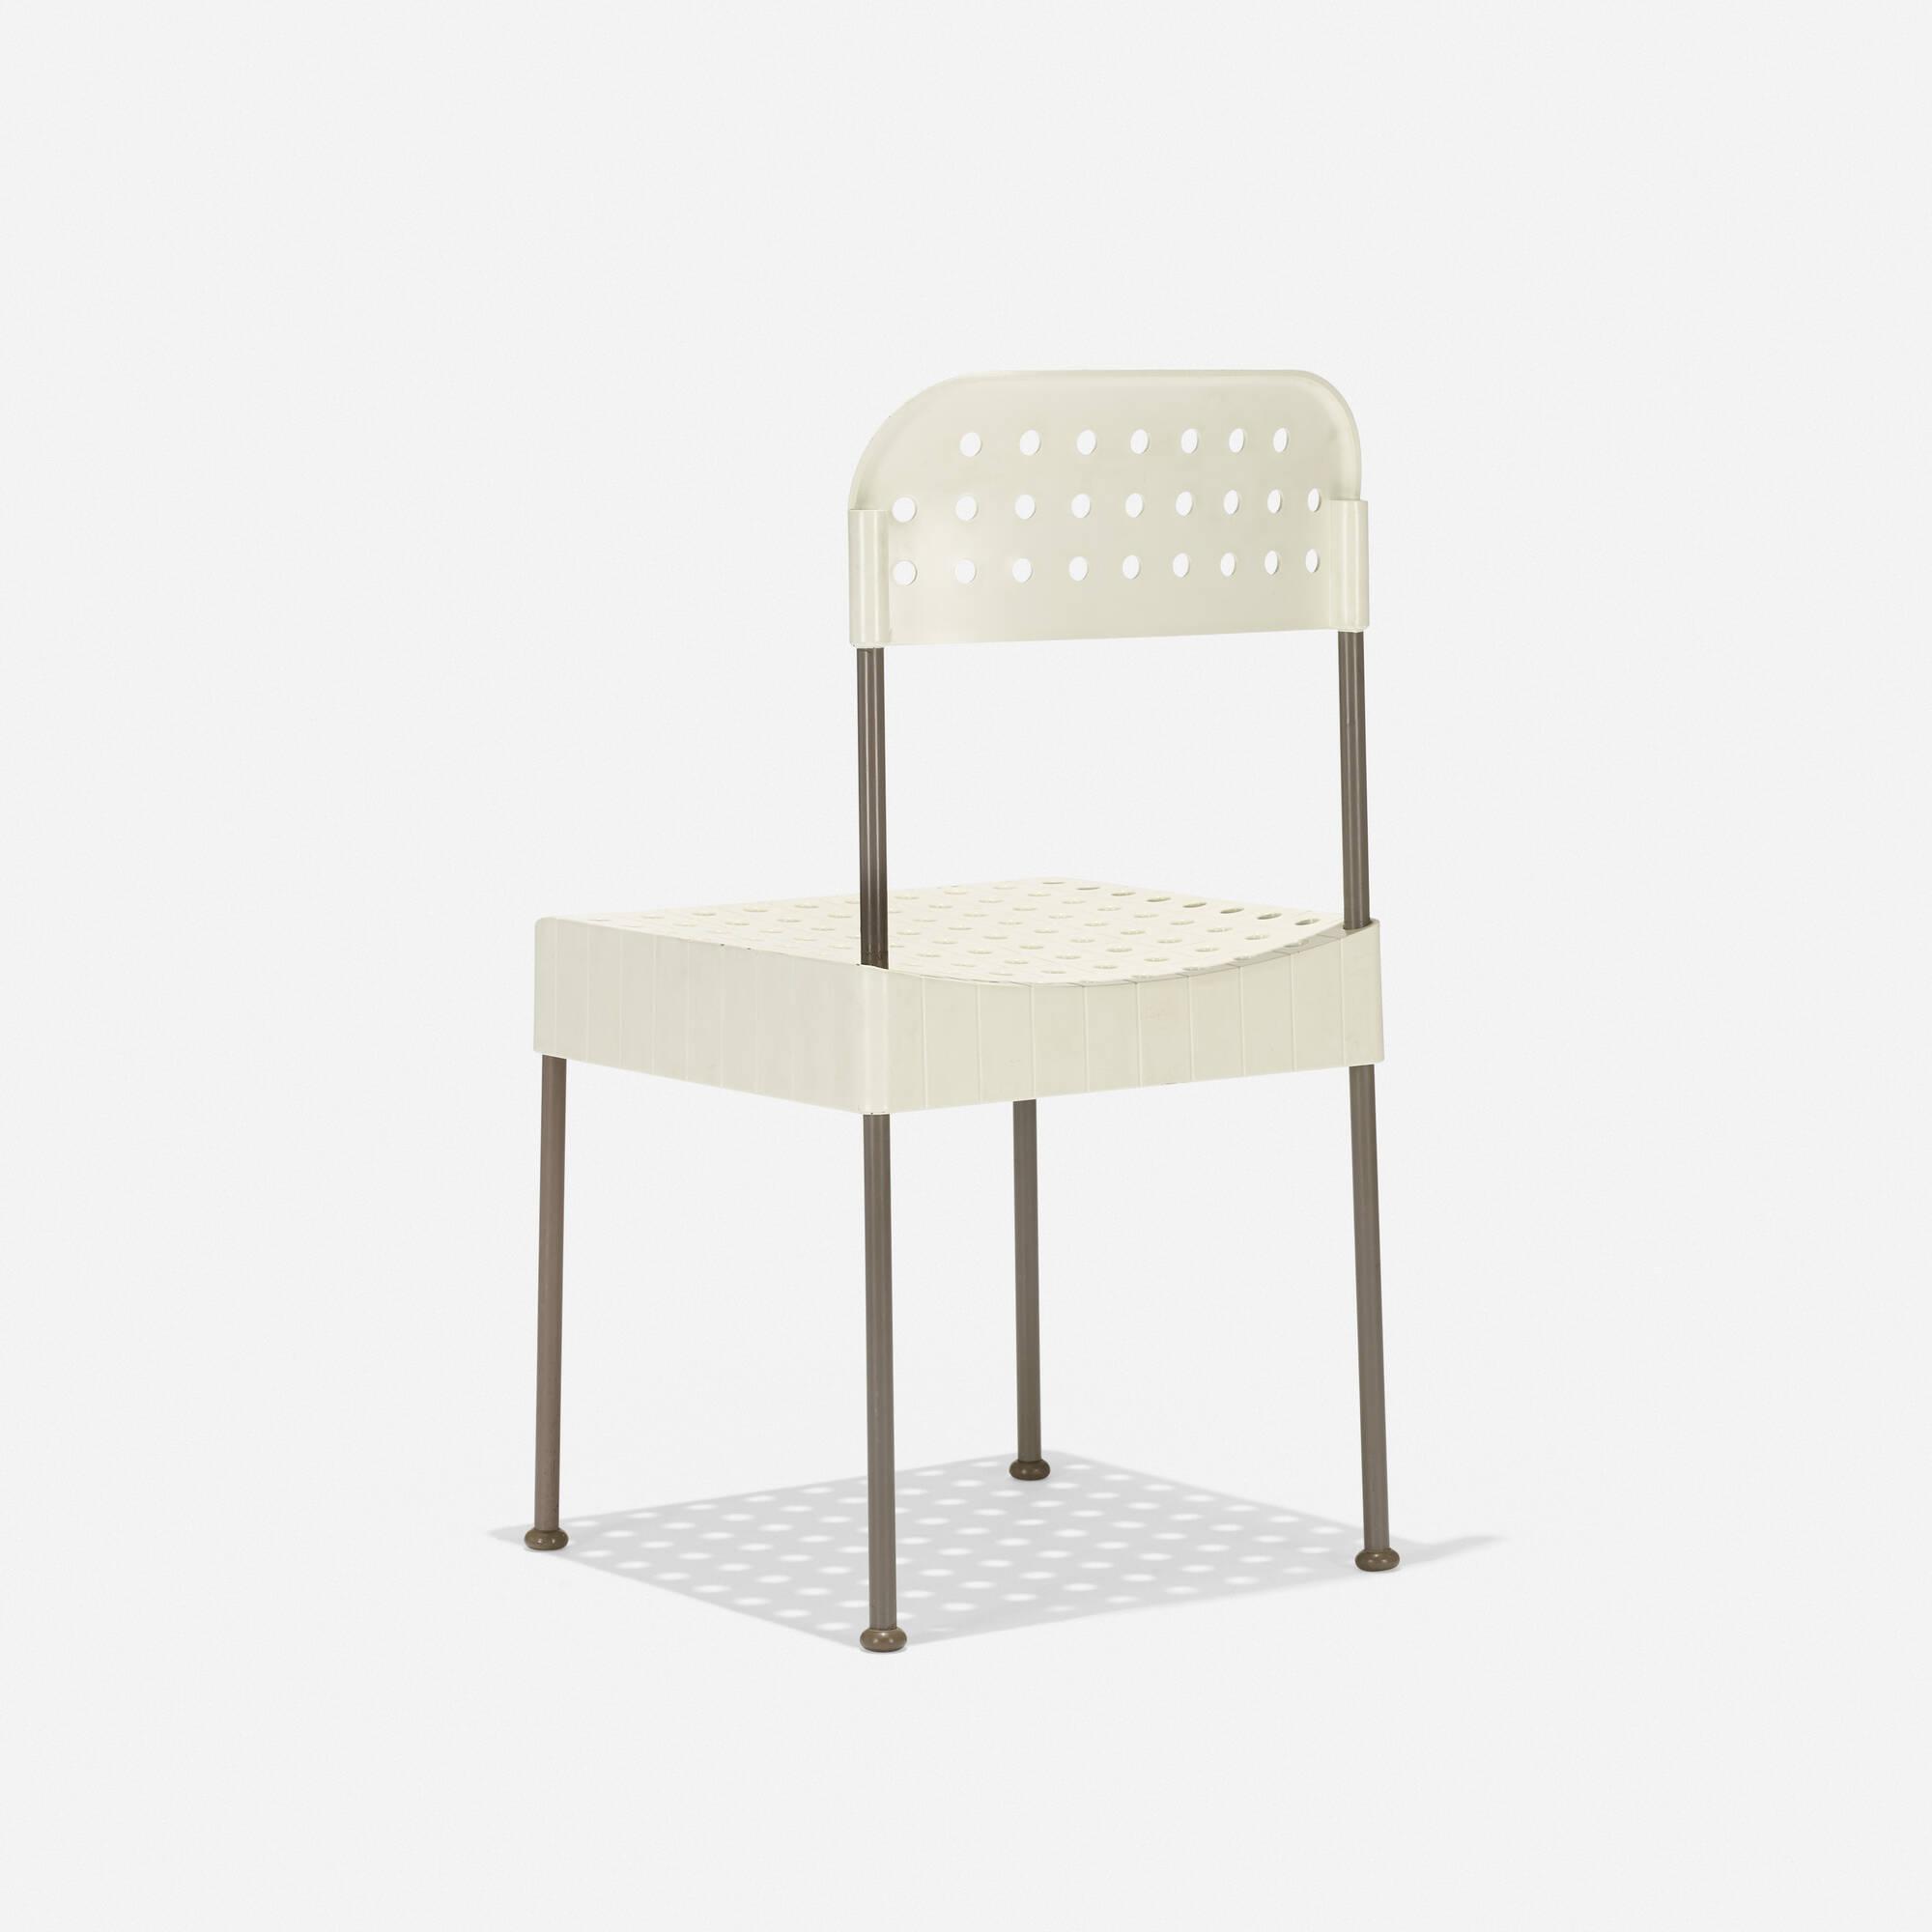 118: Enzo Mari / Box chair (2 of 3)